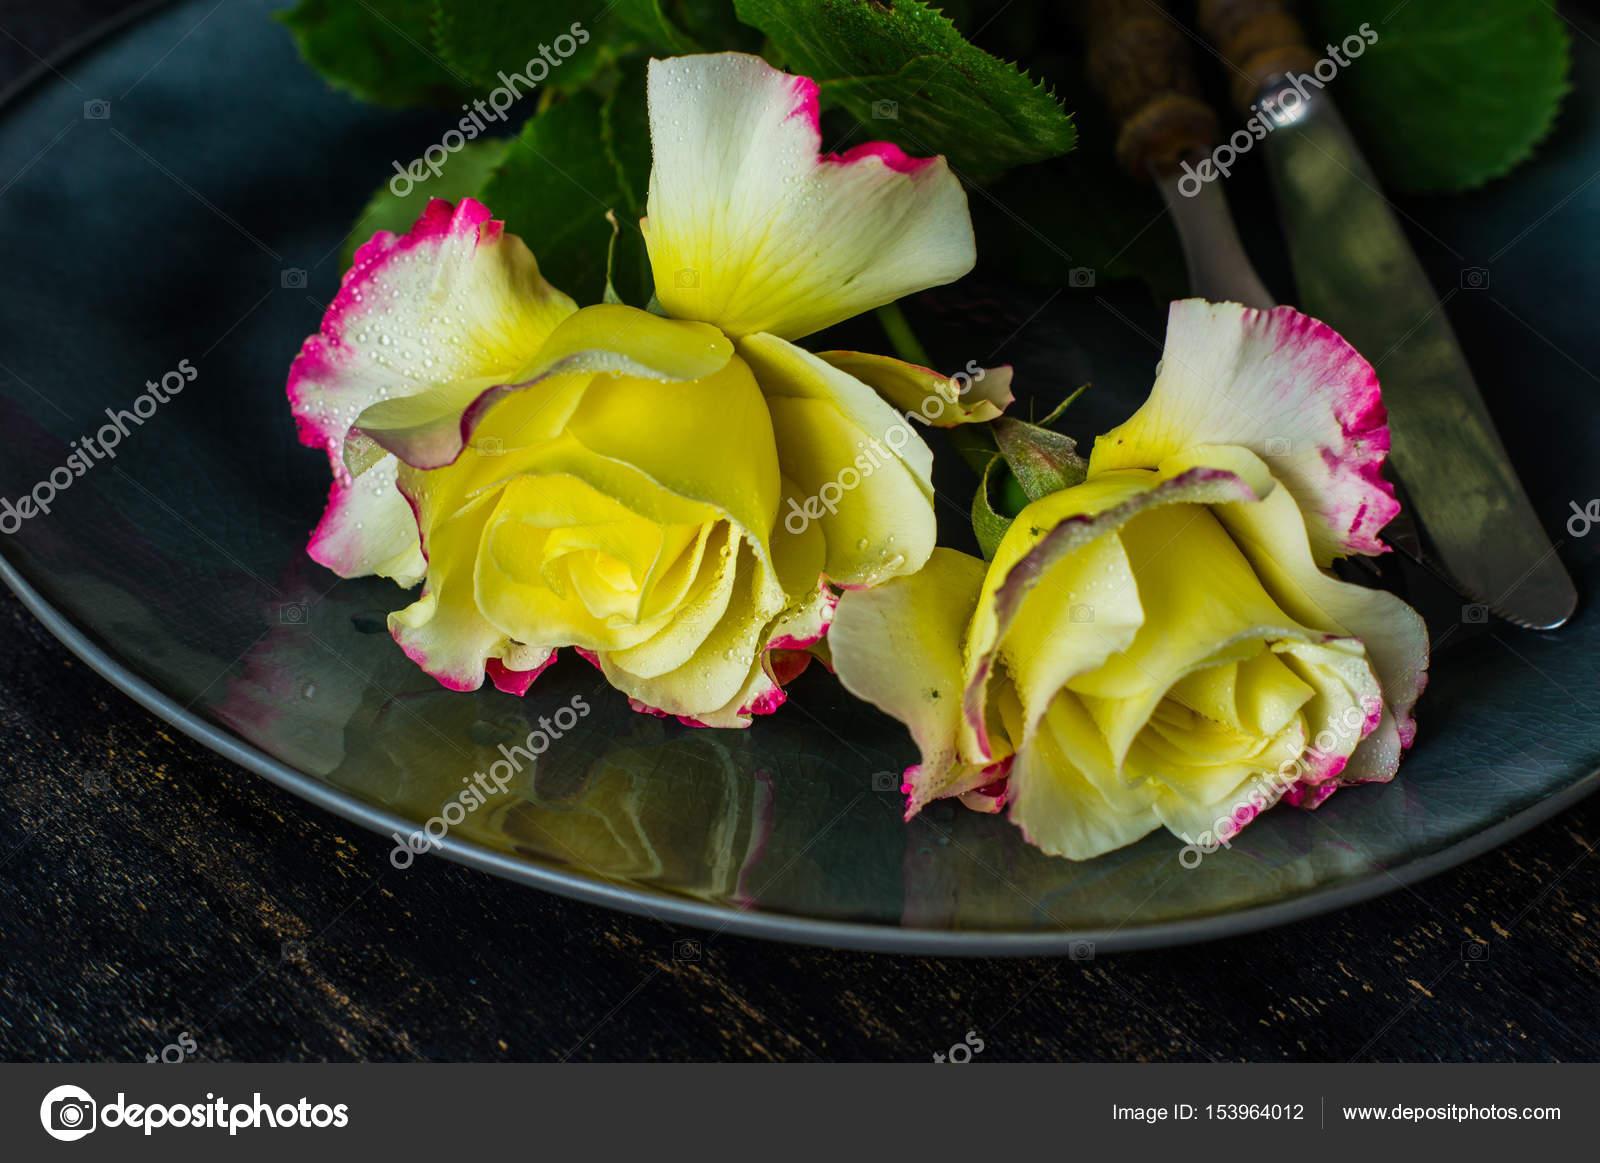 Sommer Tischdekoration Mit Rosen Stockfoto C Elet 1 153964012